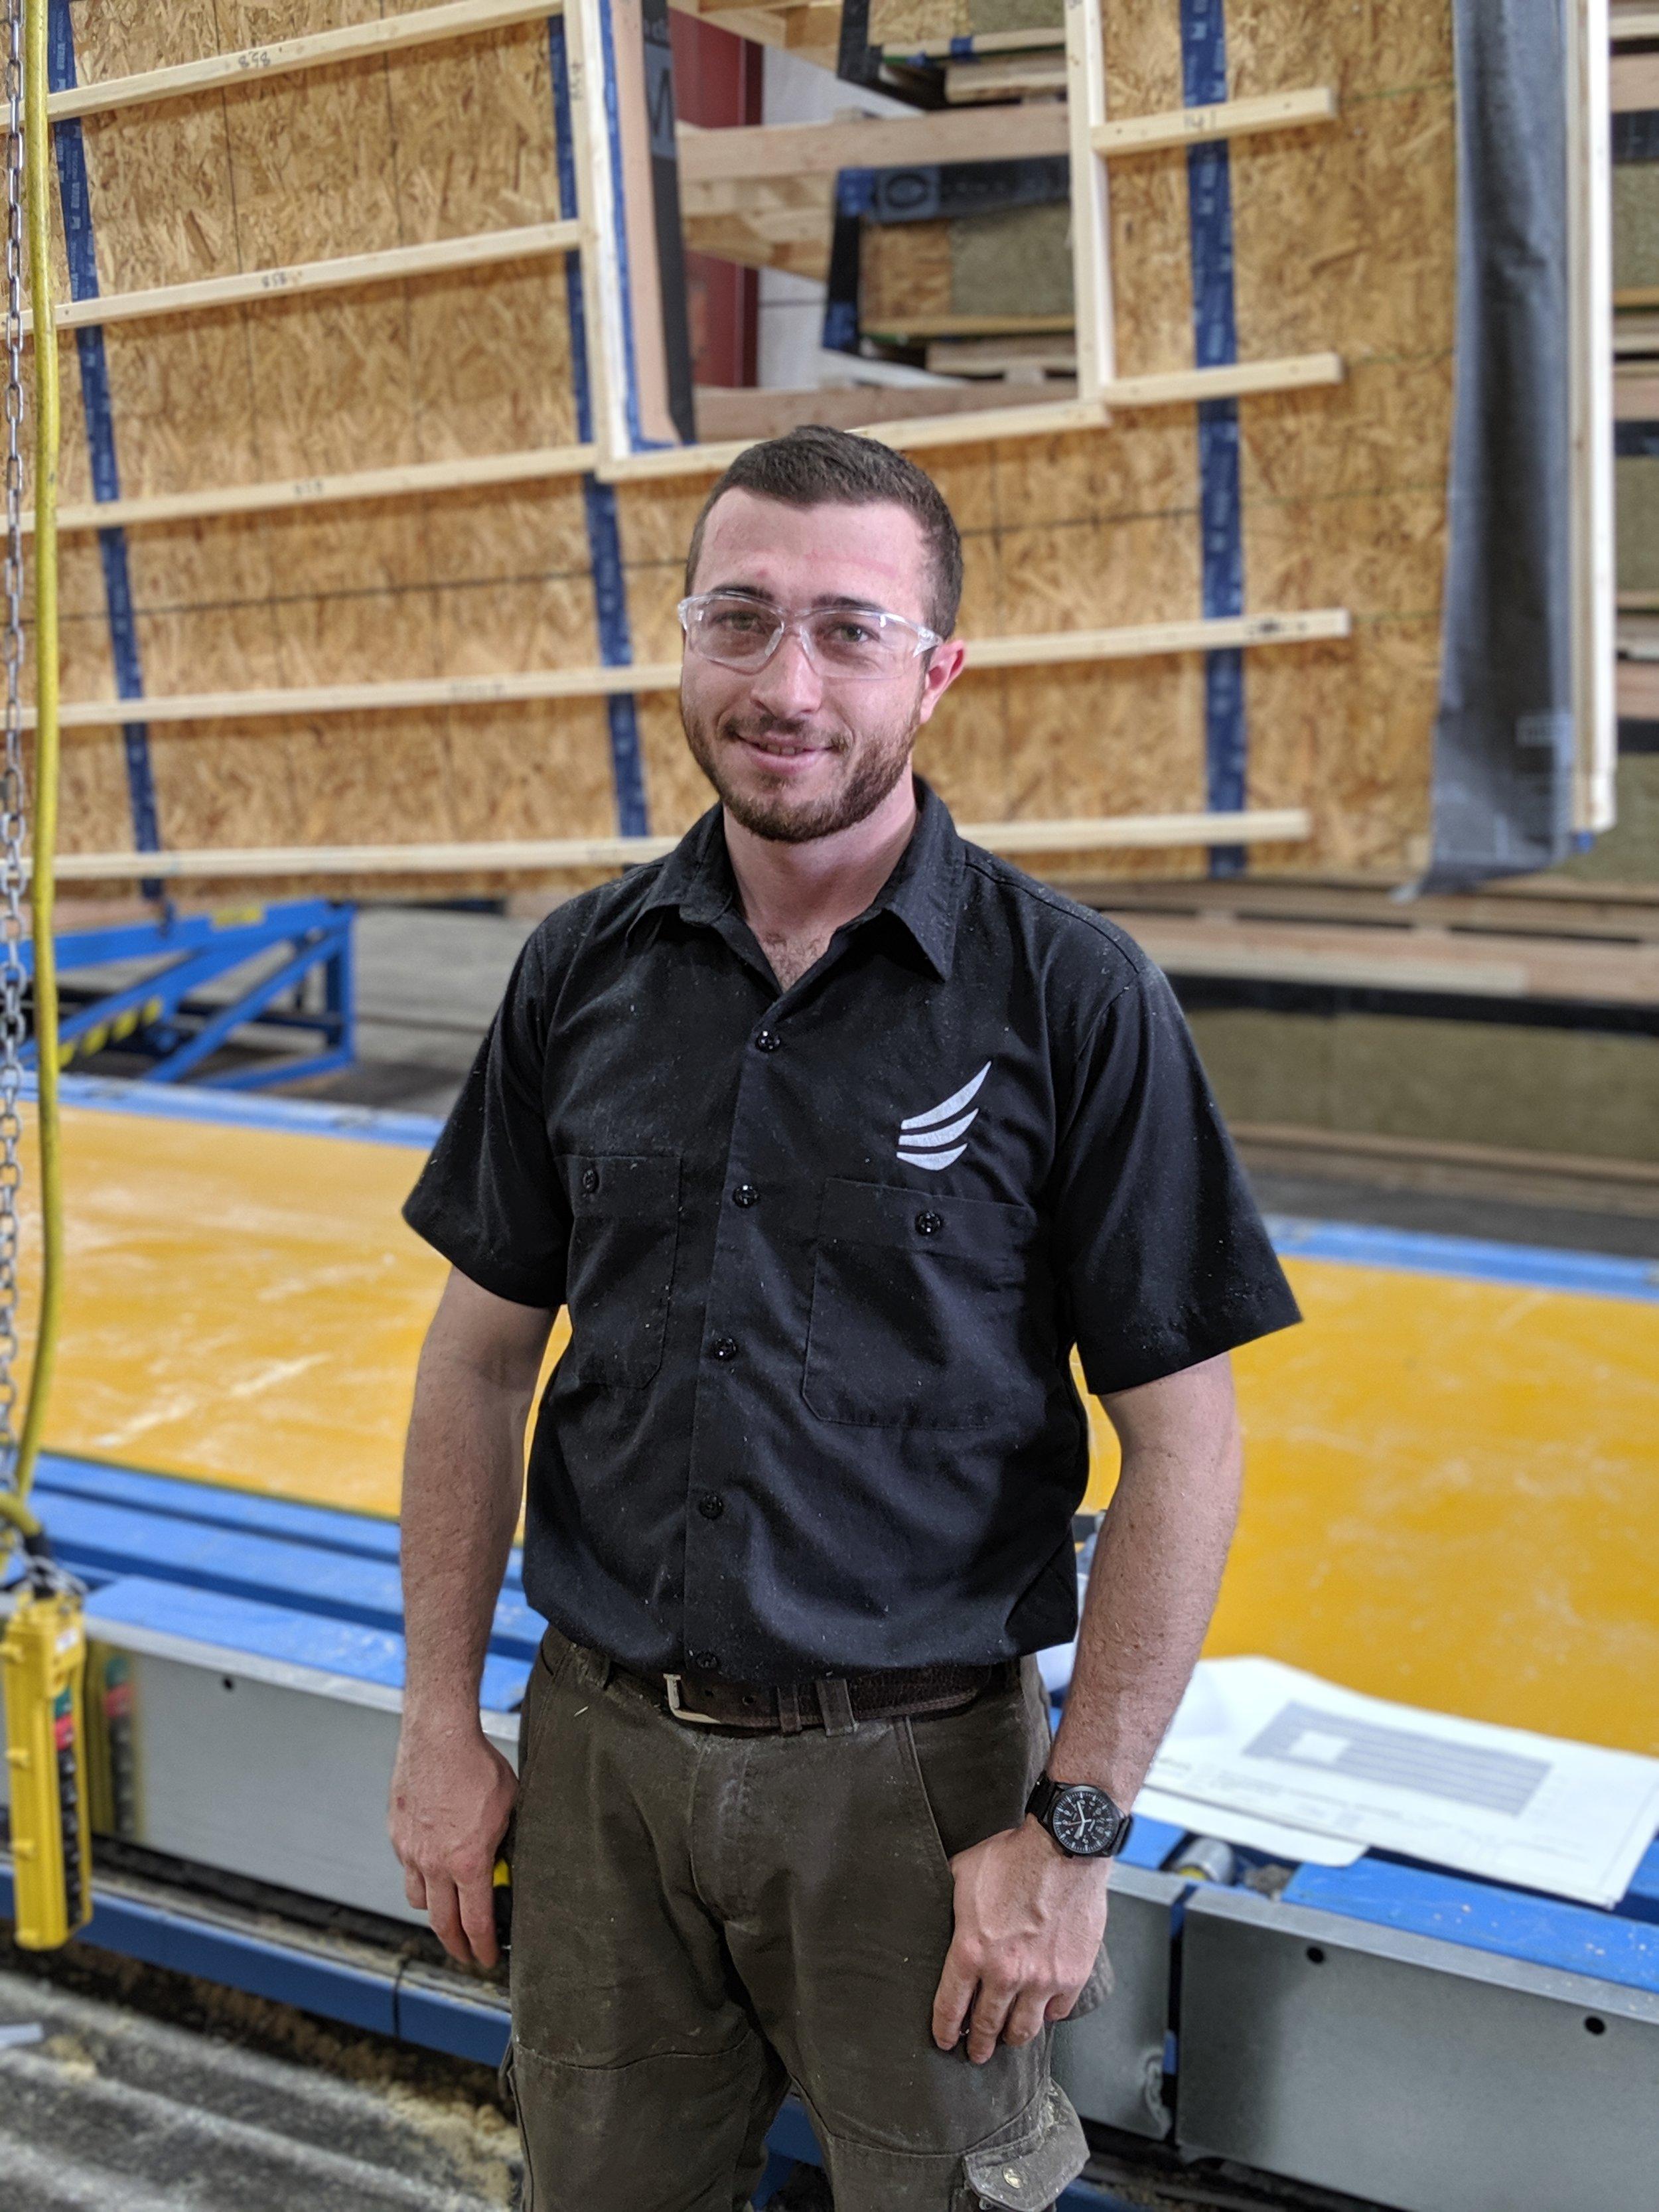 Sam Lohman - Shop Technician & Assembly Crew Member